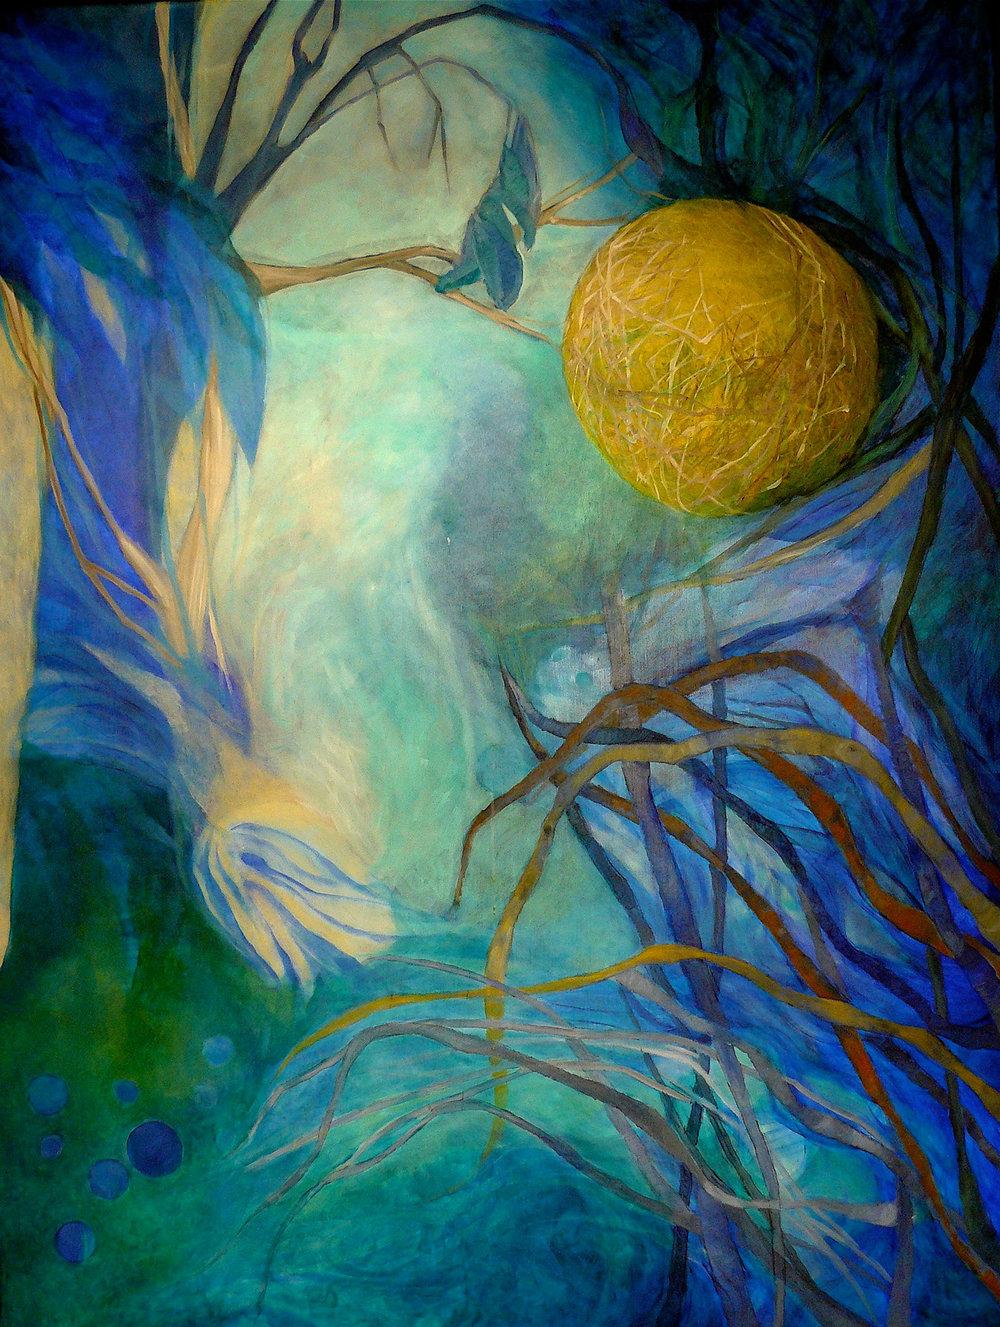 El sonido del sol - Óleo sobre tela - 160 x 120 cm